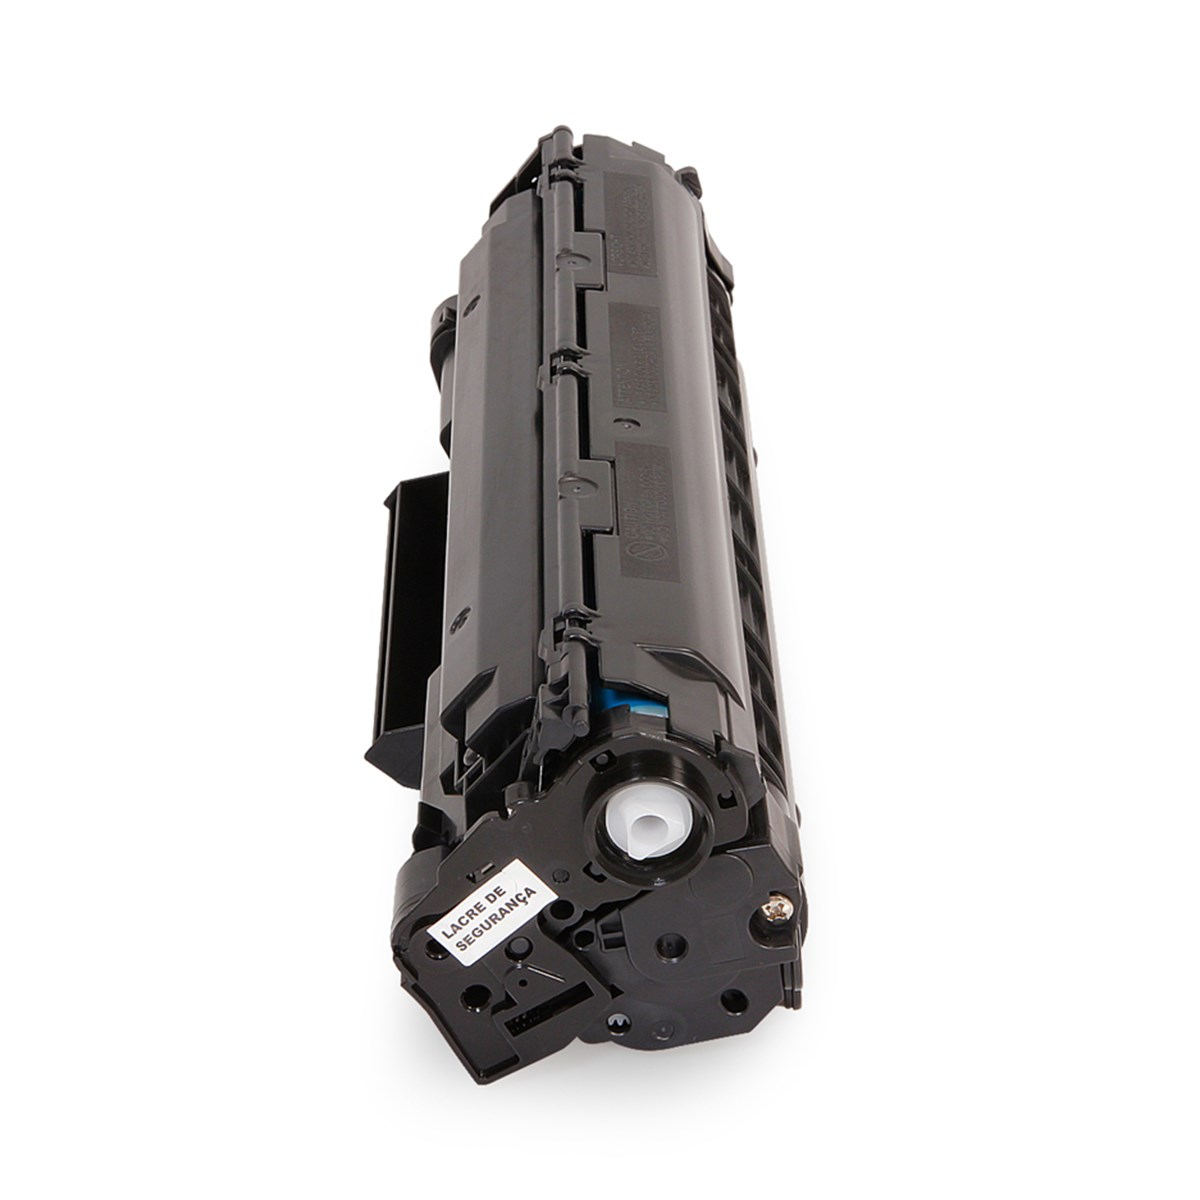 Compativel: Toner novasupri CB435A para HP P1005 P1505 M1120 M1210 M1212 M1130